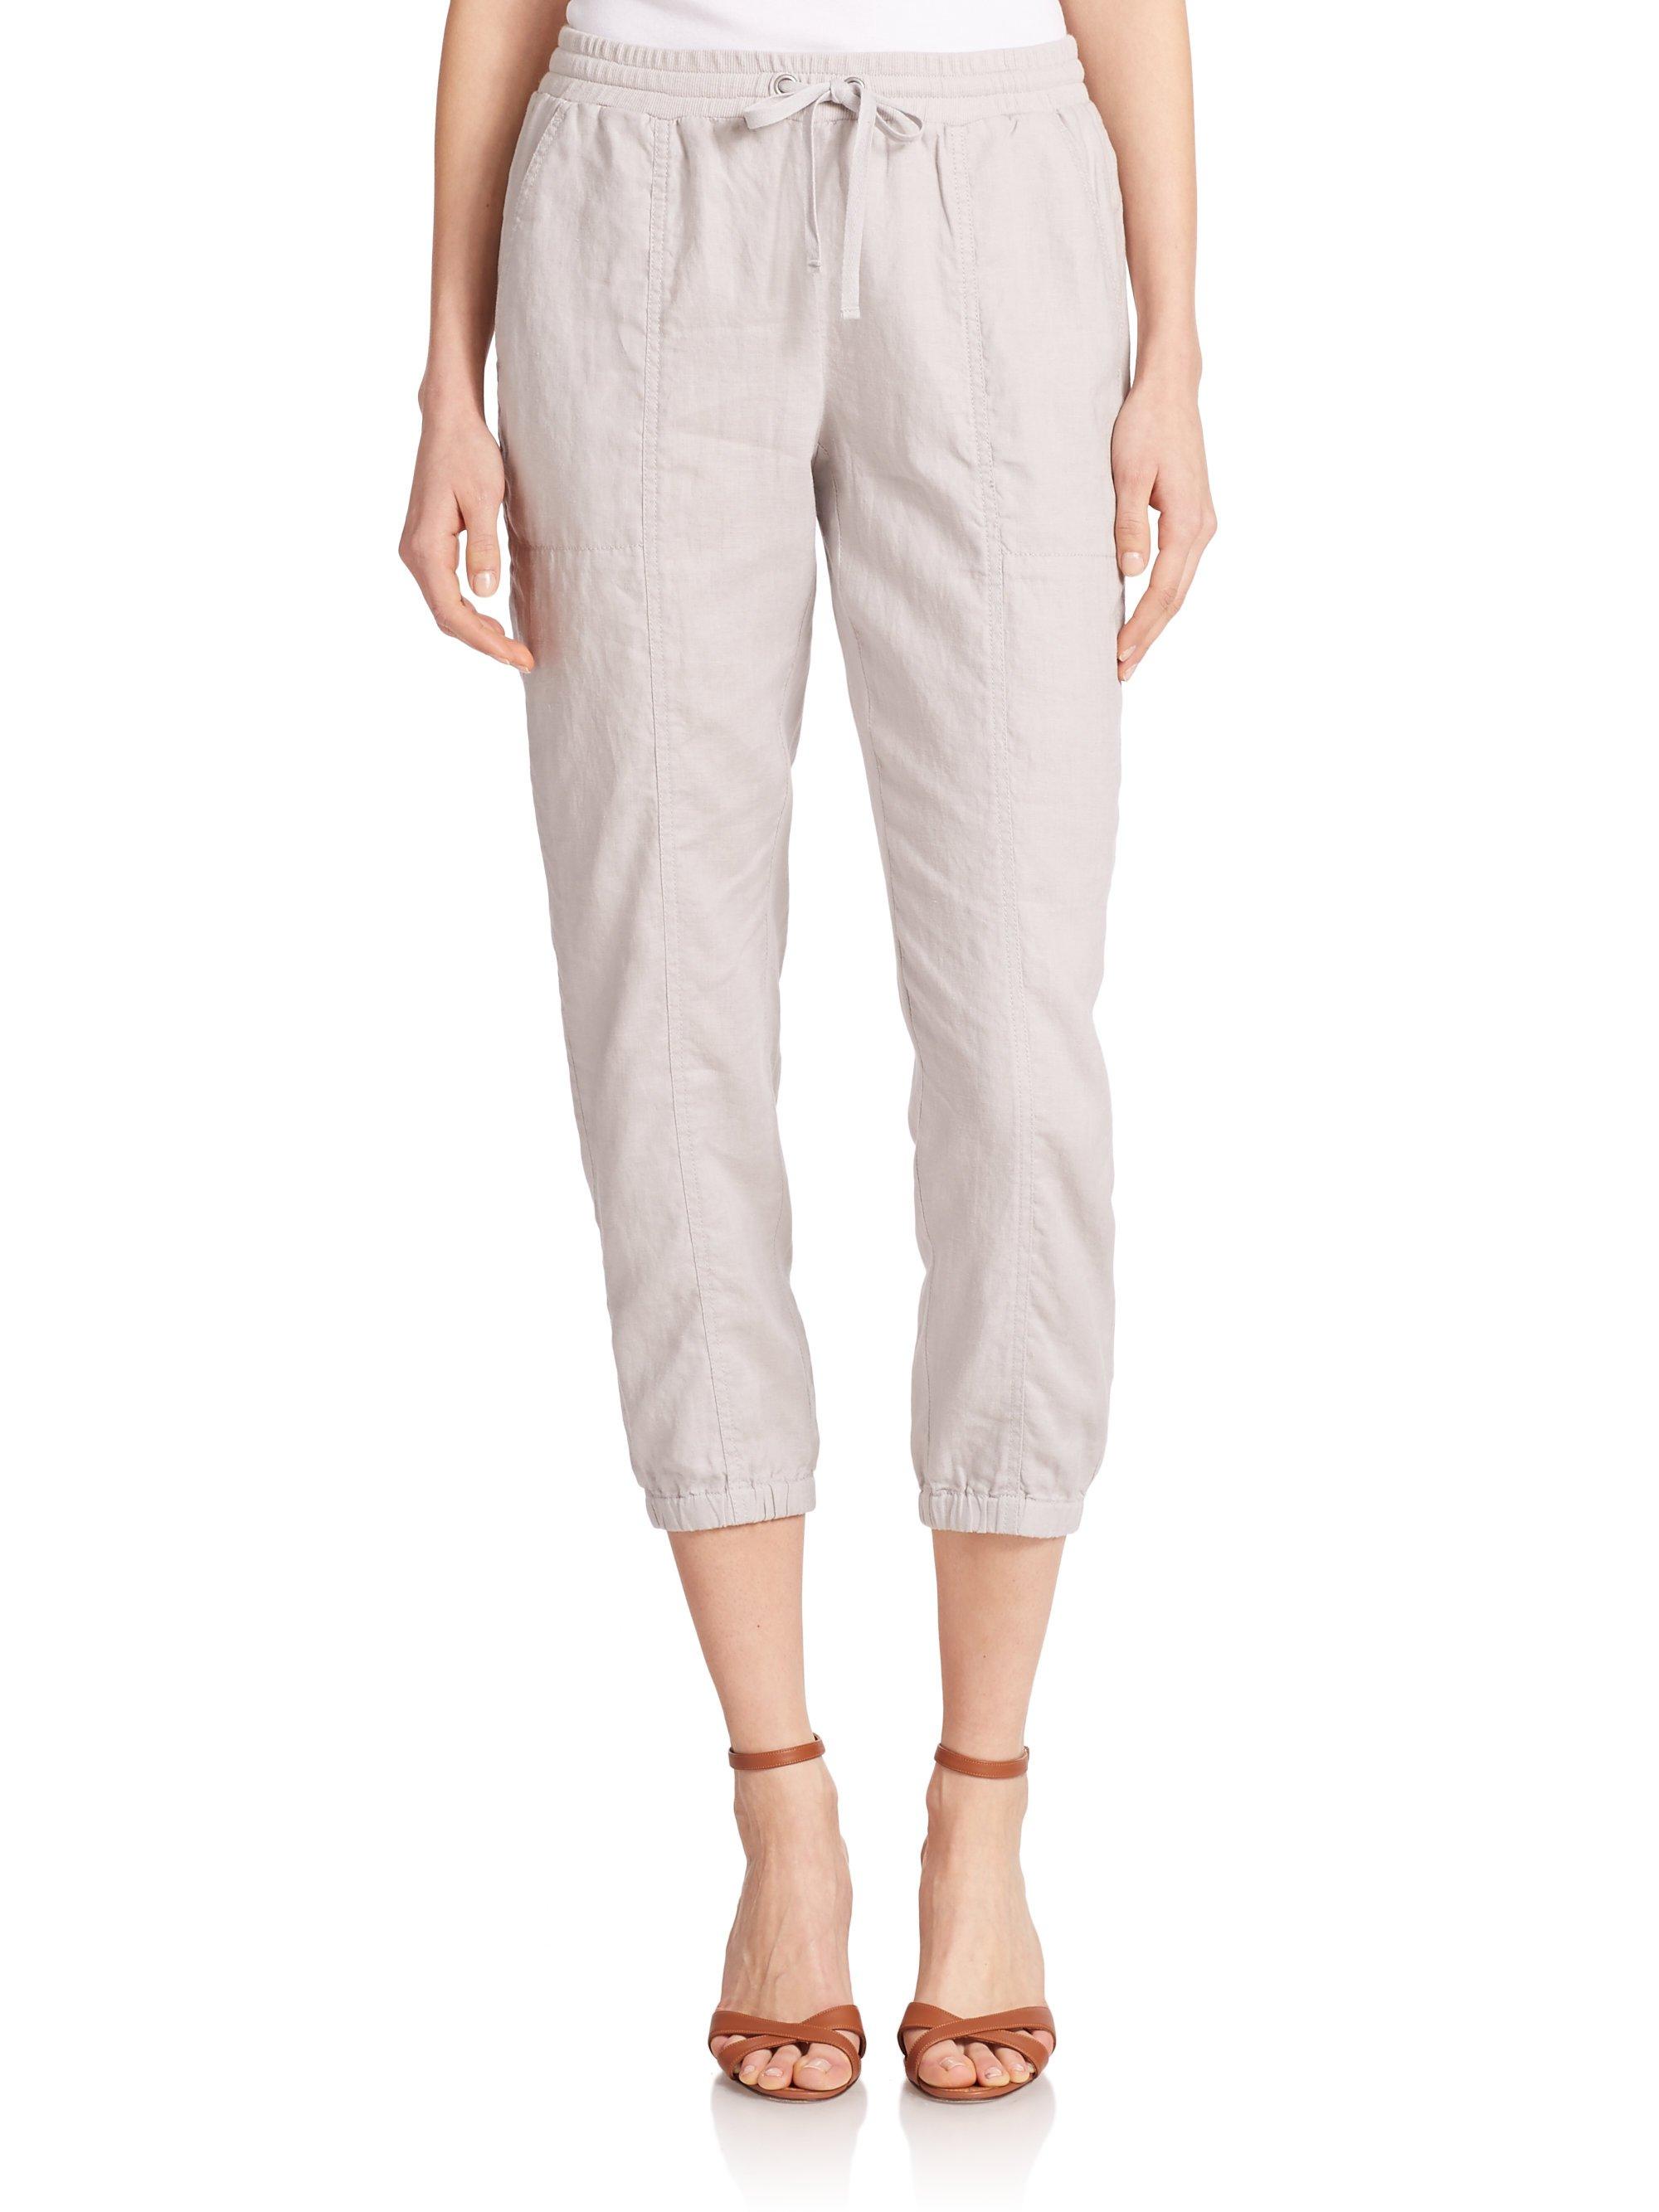 Model Grey Linen Pants Womens | Pant So